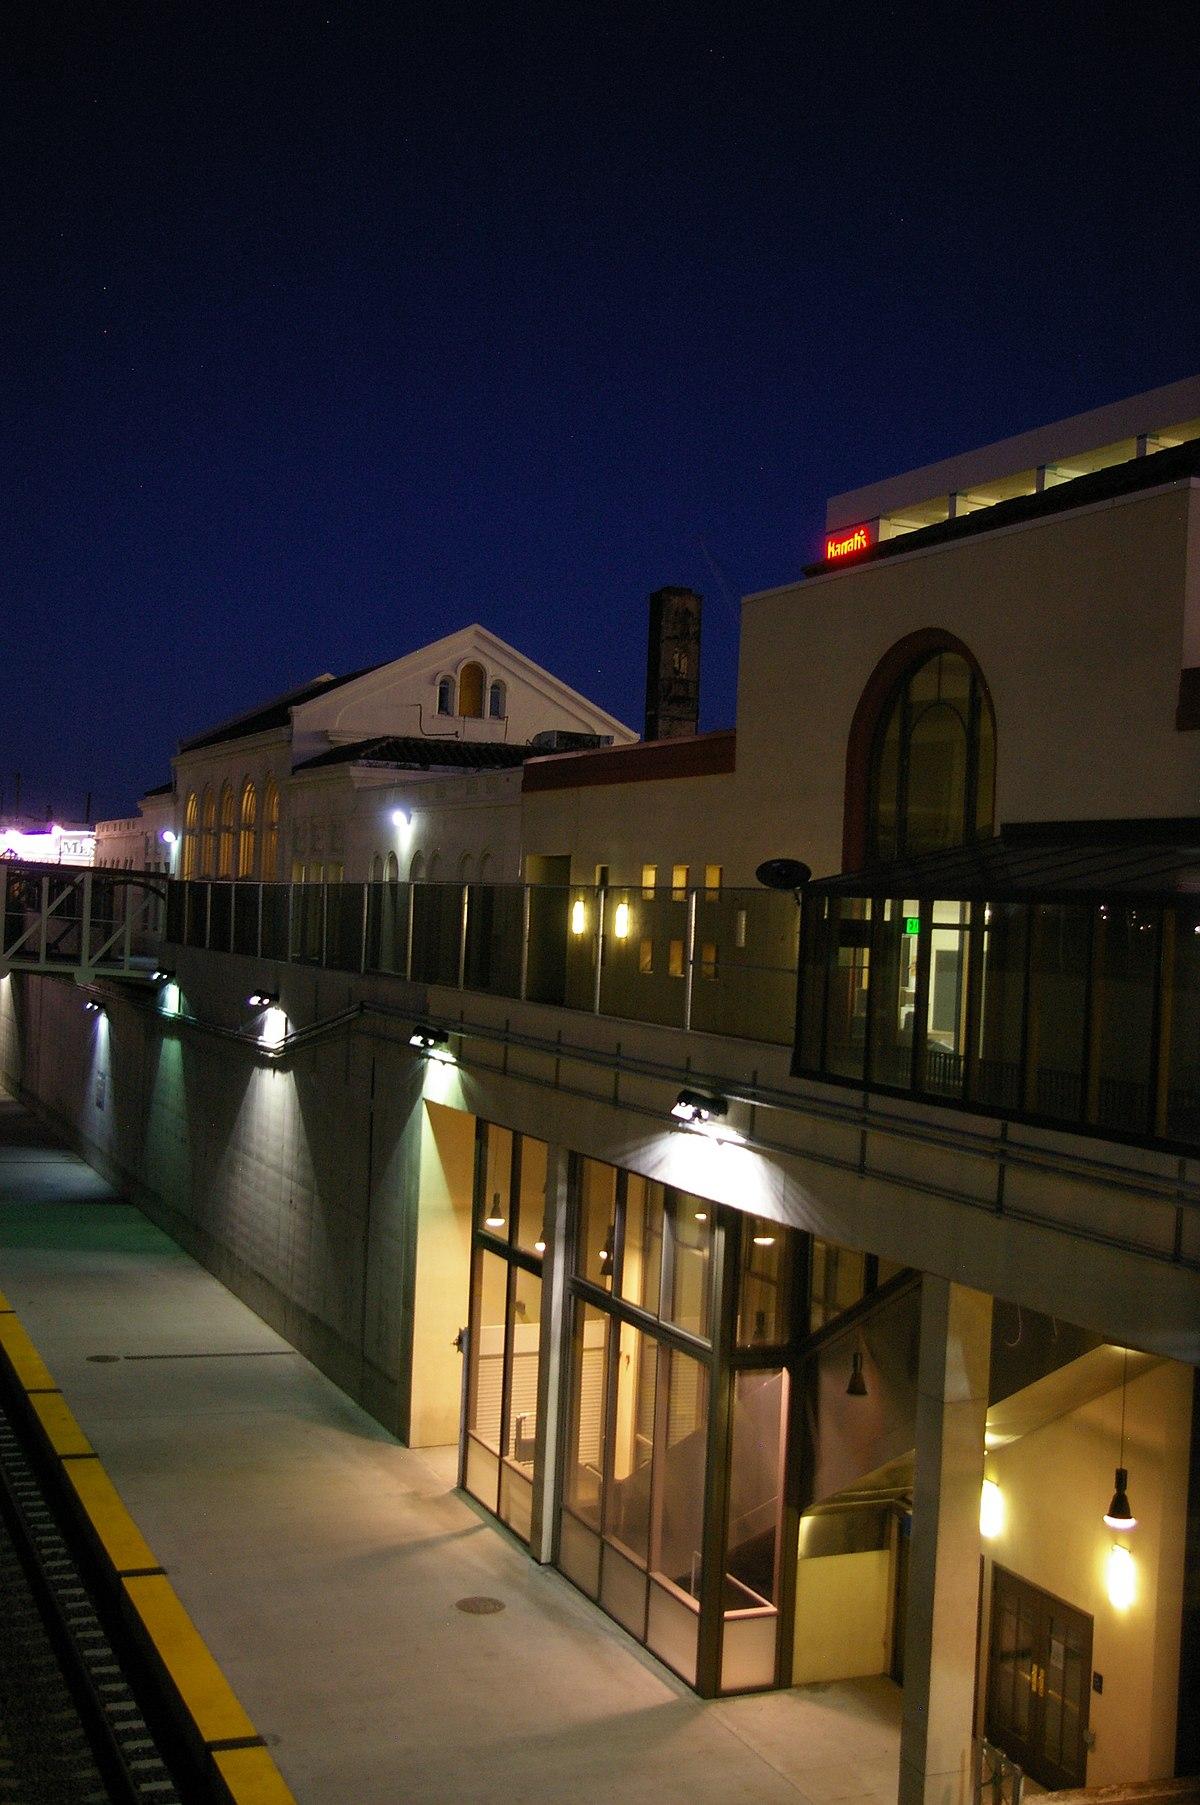 Reno Station Wikipedia